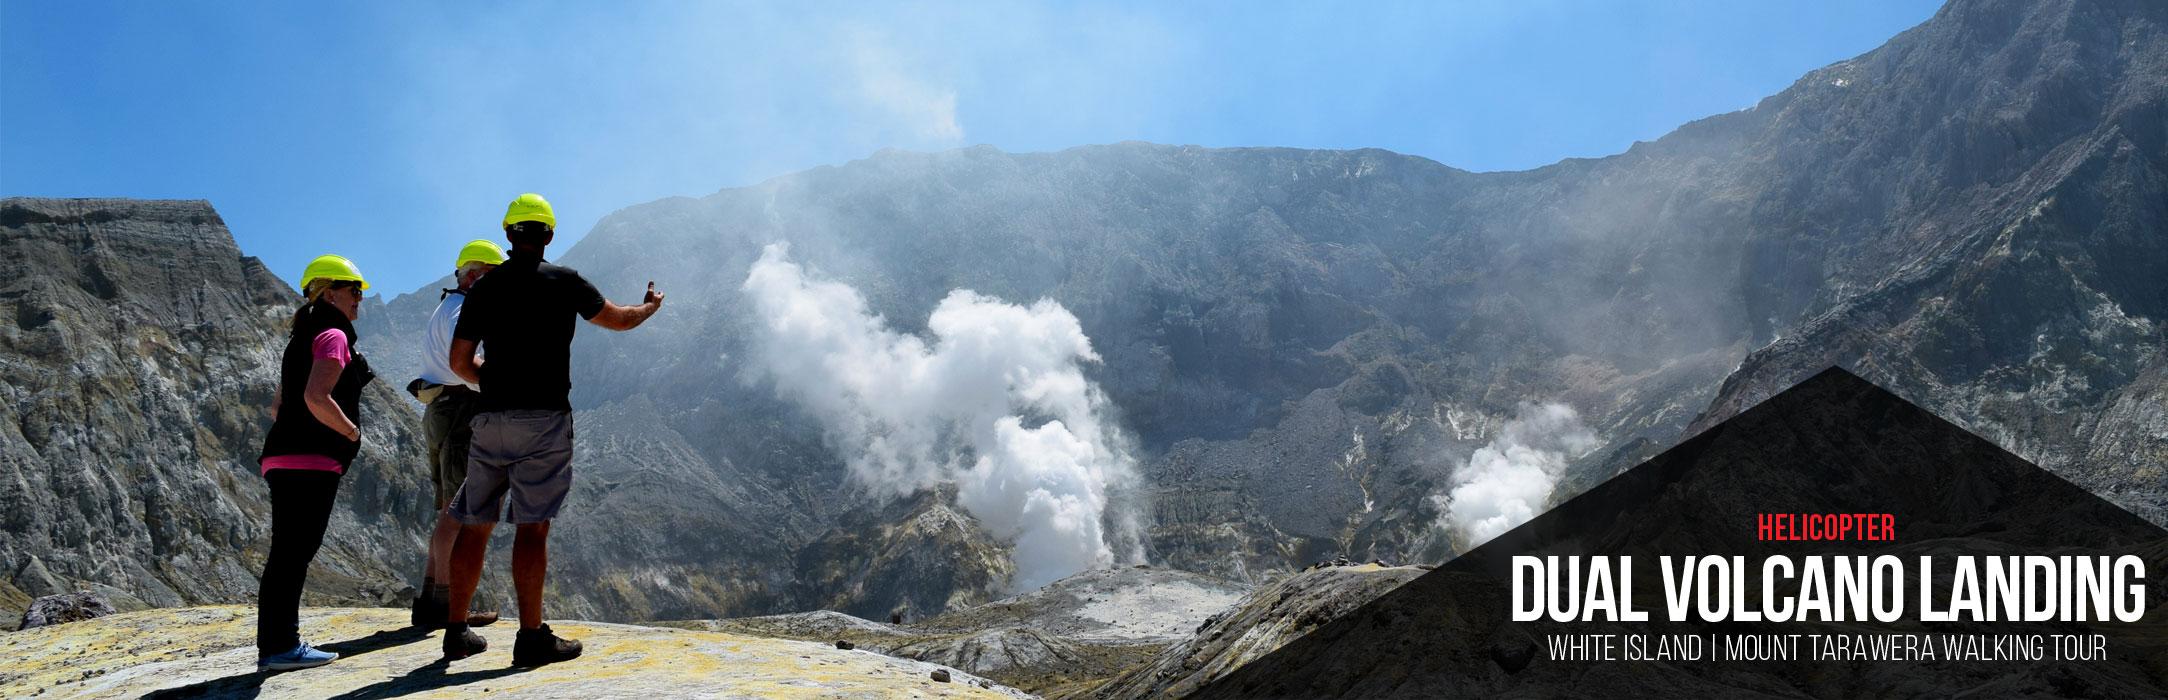 White Island - Volcanic Air Rotorua